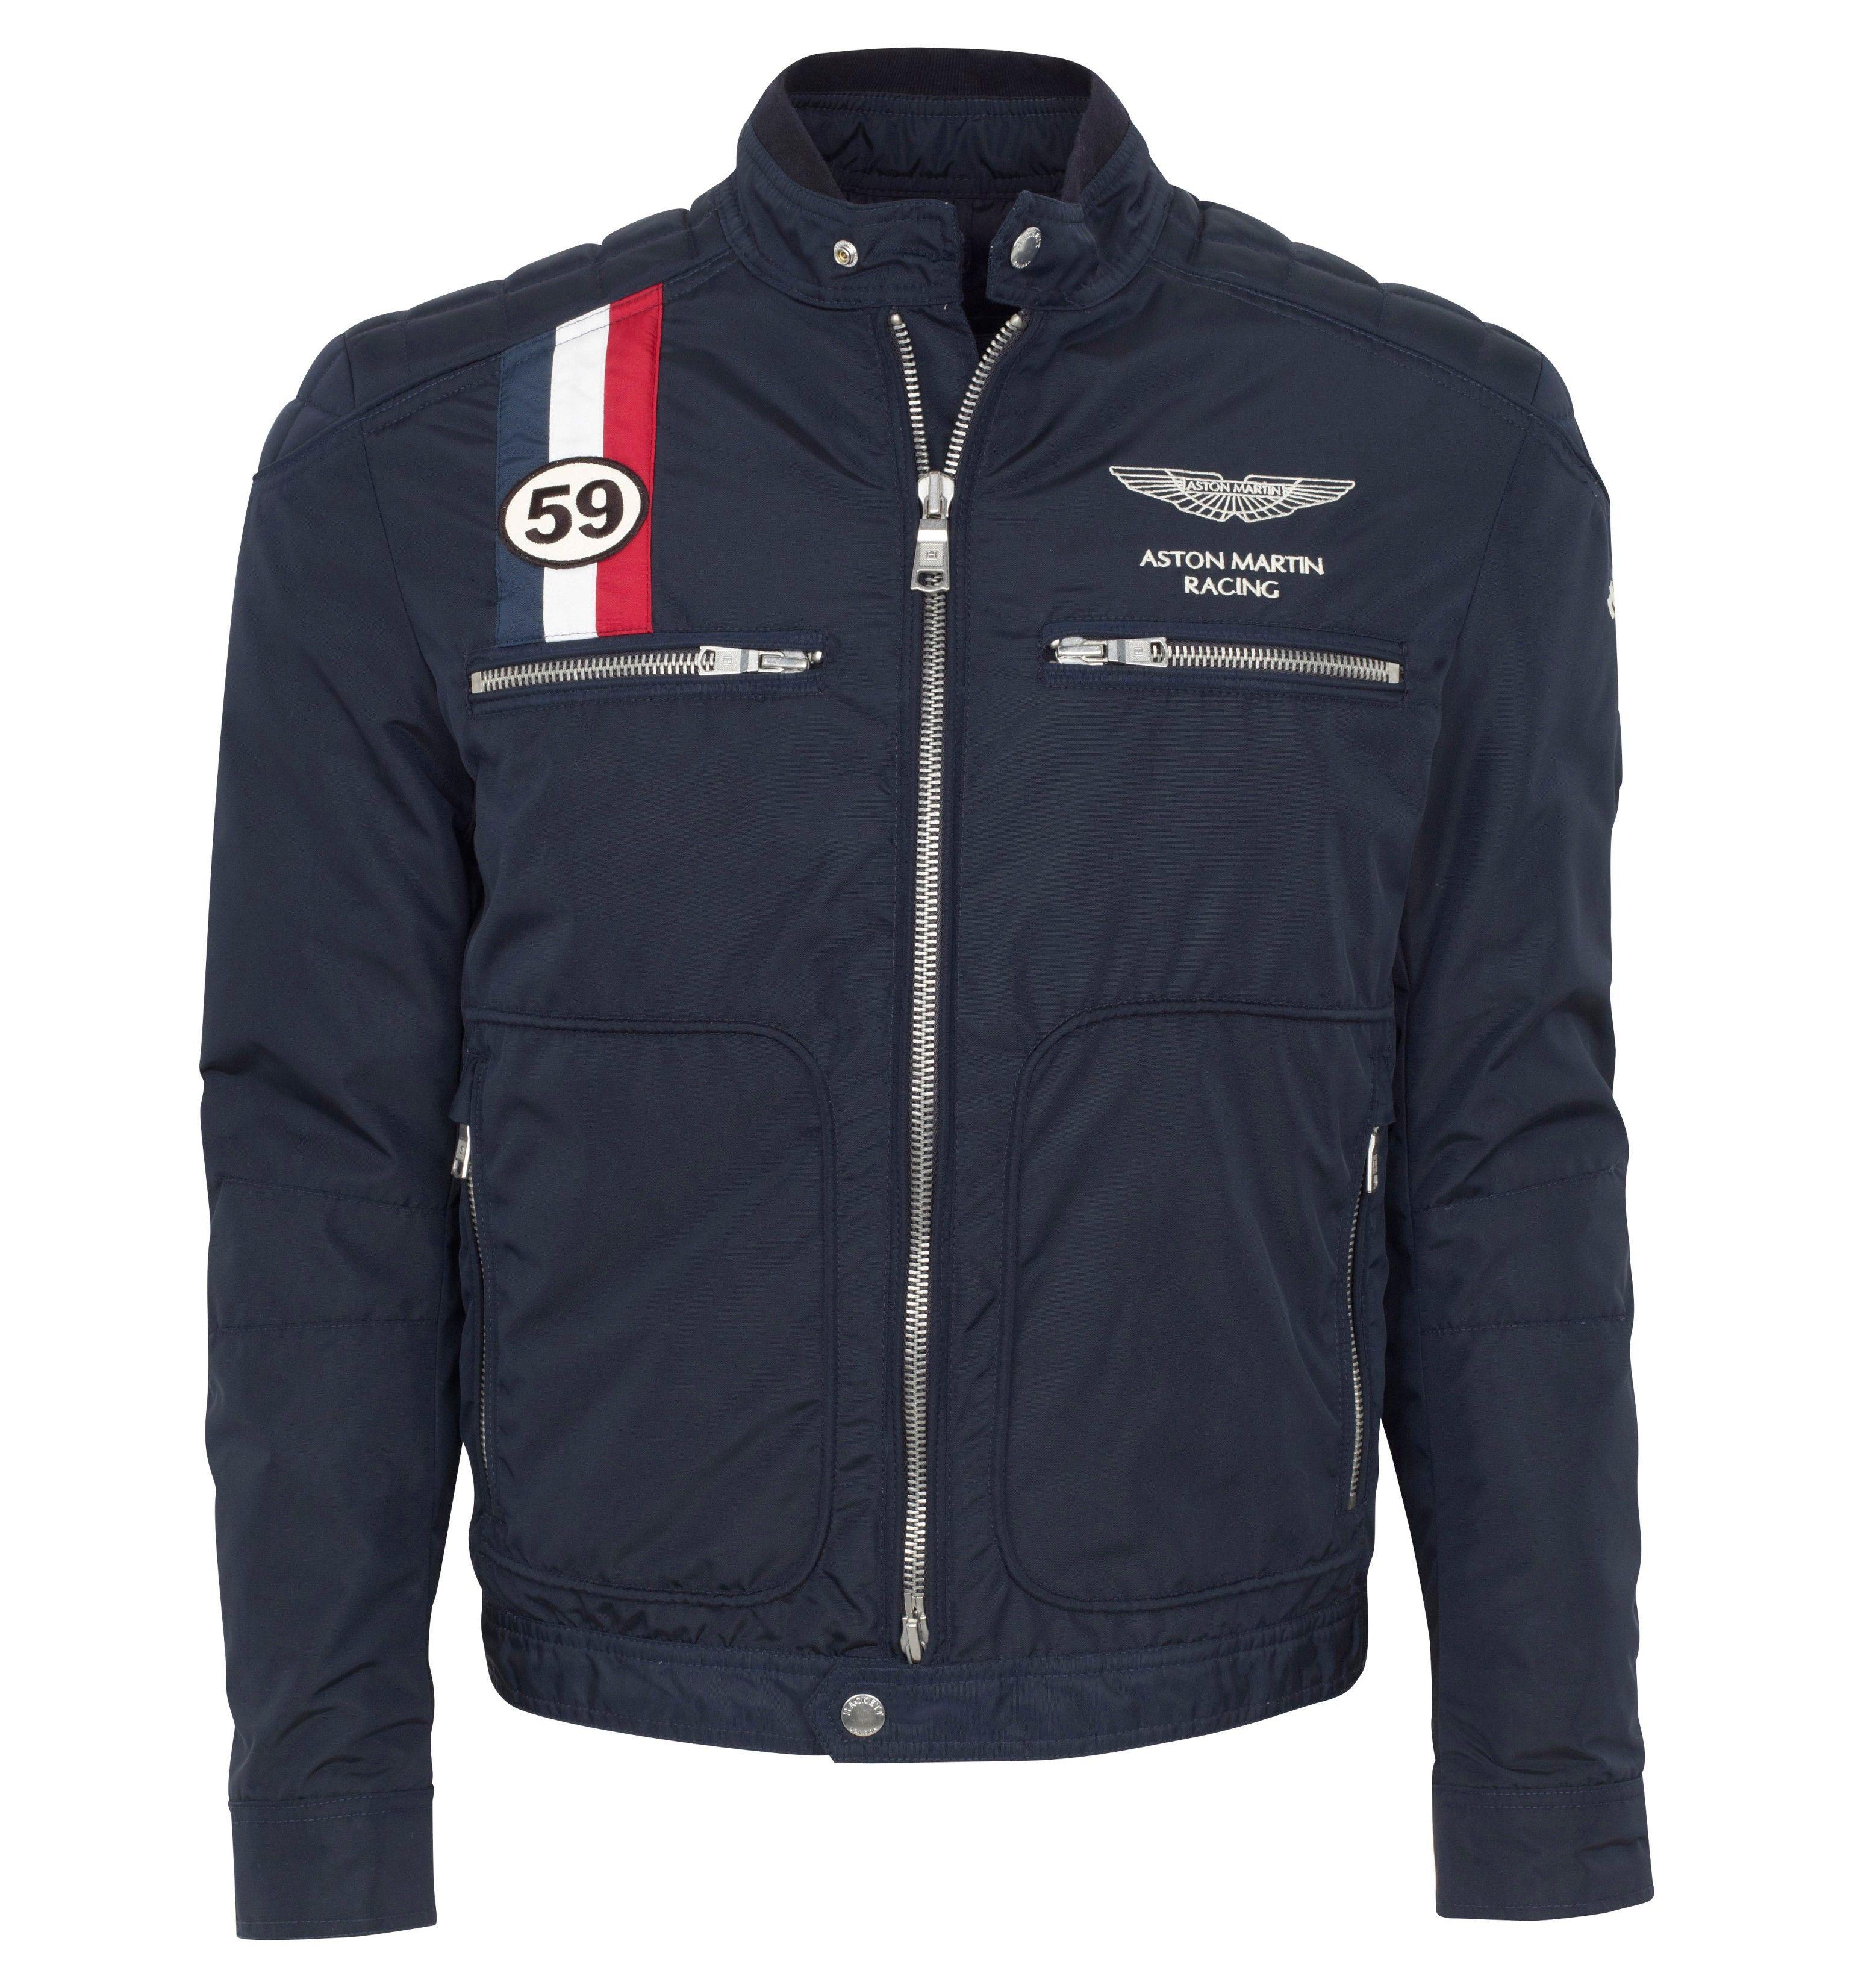 Hackett - Aston Martin Racing GB Moto Jacket | 600.00 from Hackett London